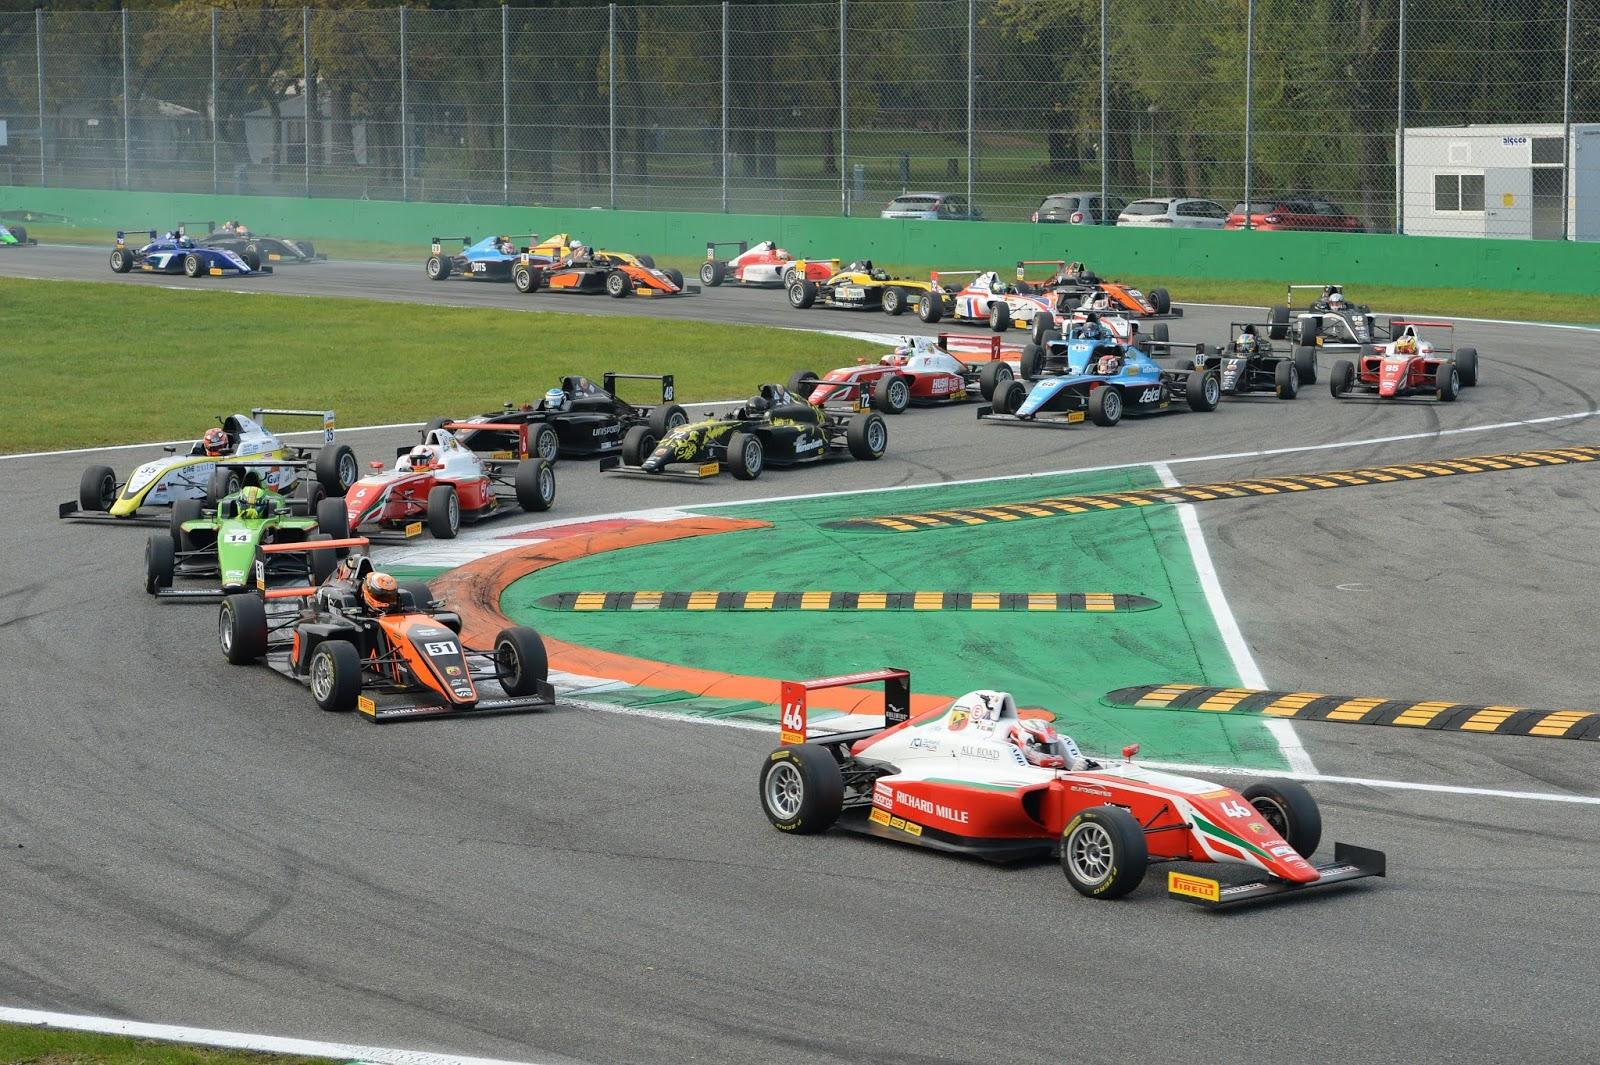 F.42BMonza2B 2BStart2BR2 1 Θέαμα και μάχες στον εναρκτήριο αγώνα του Ιταλικού Πρωταθλήματος Formula 4